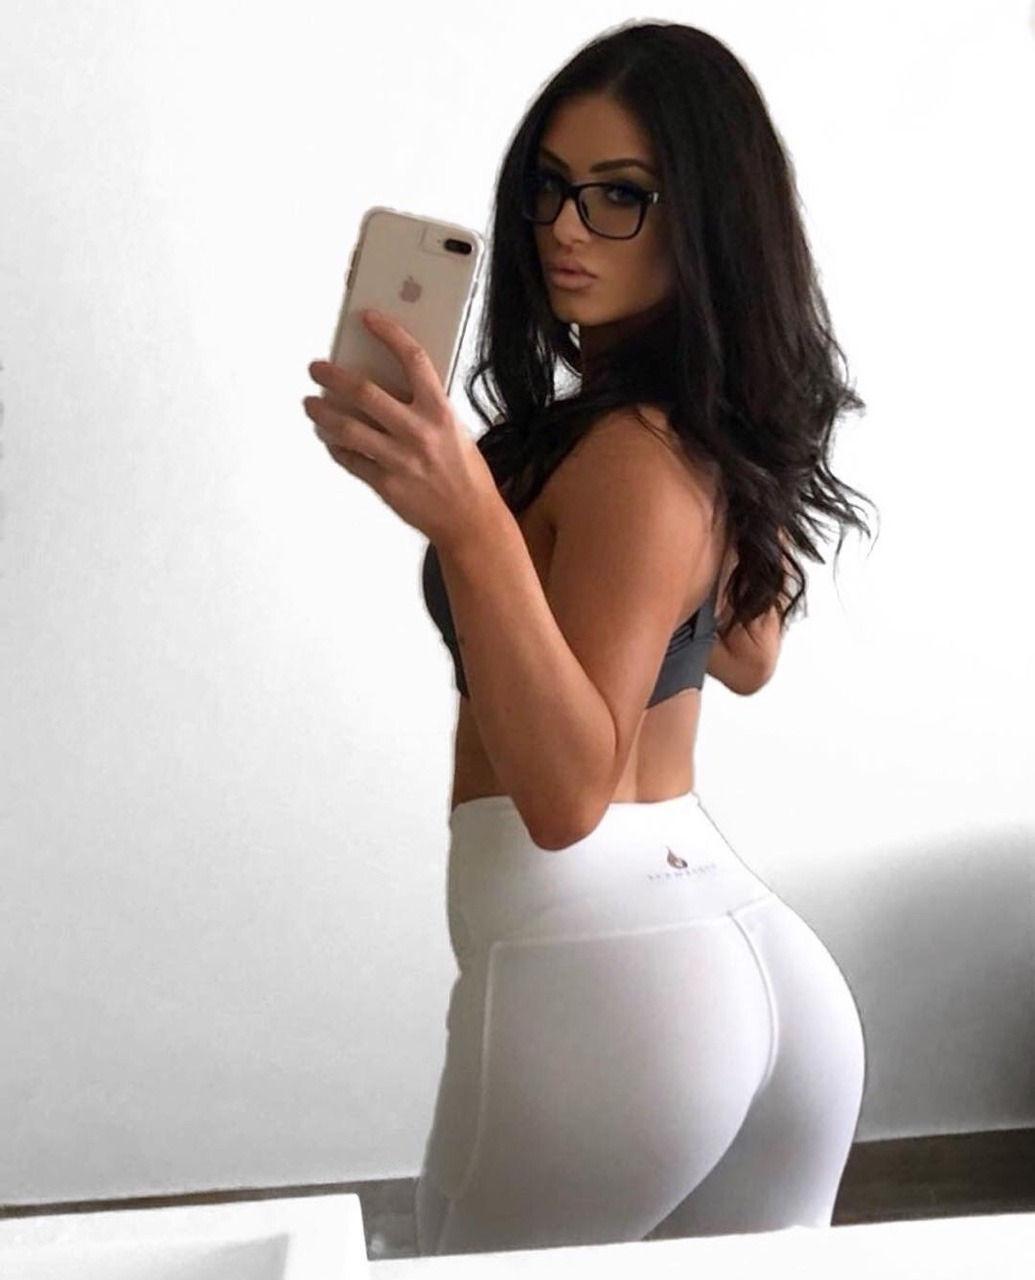 Nice curves..